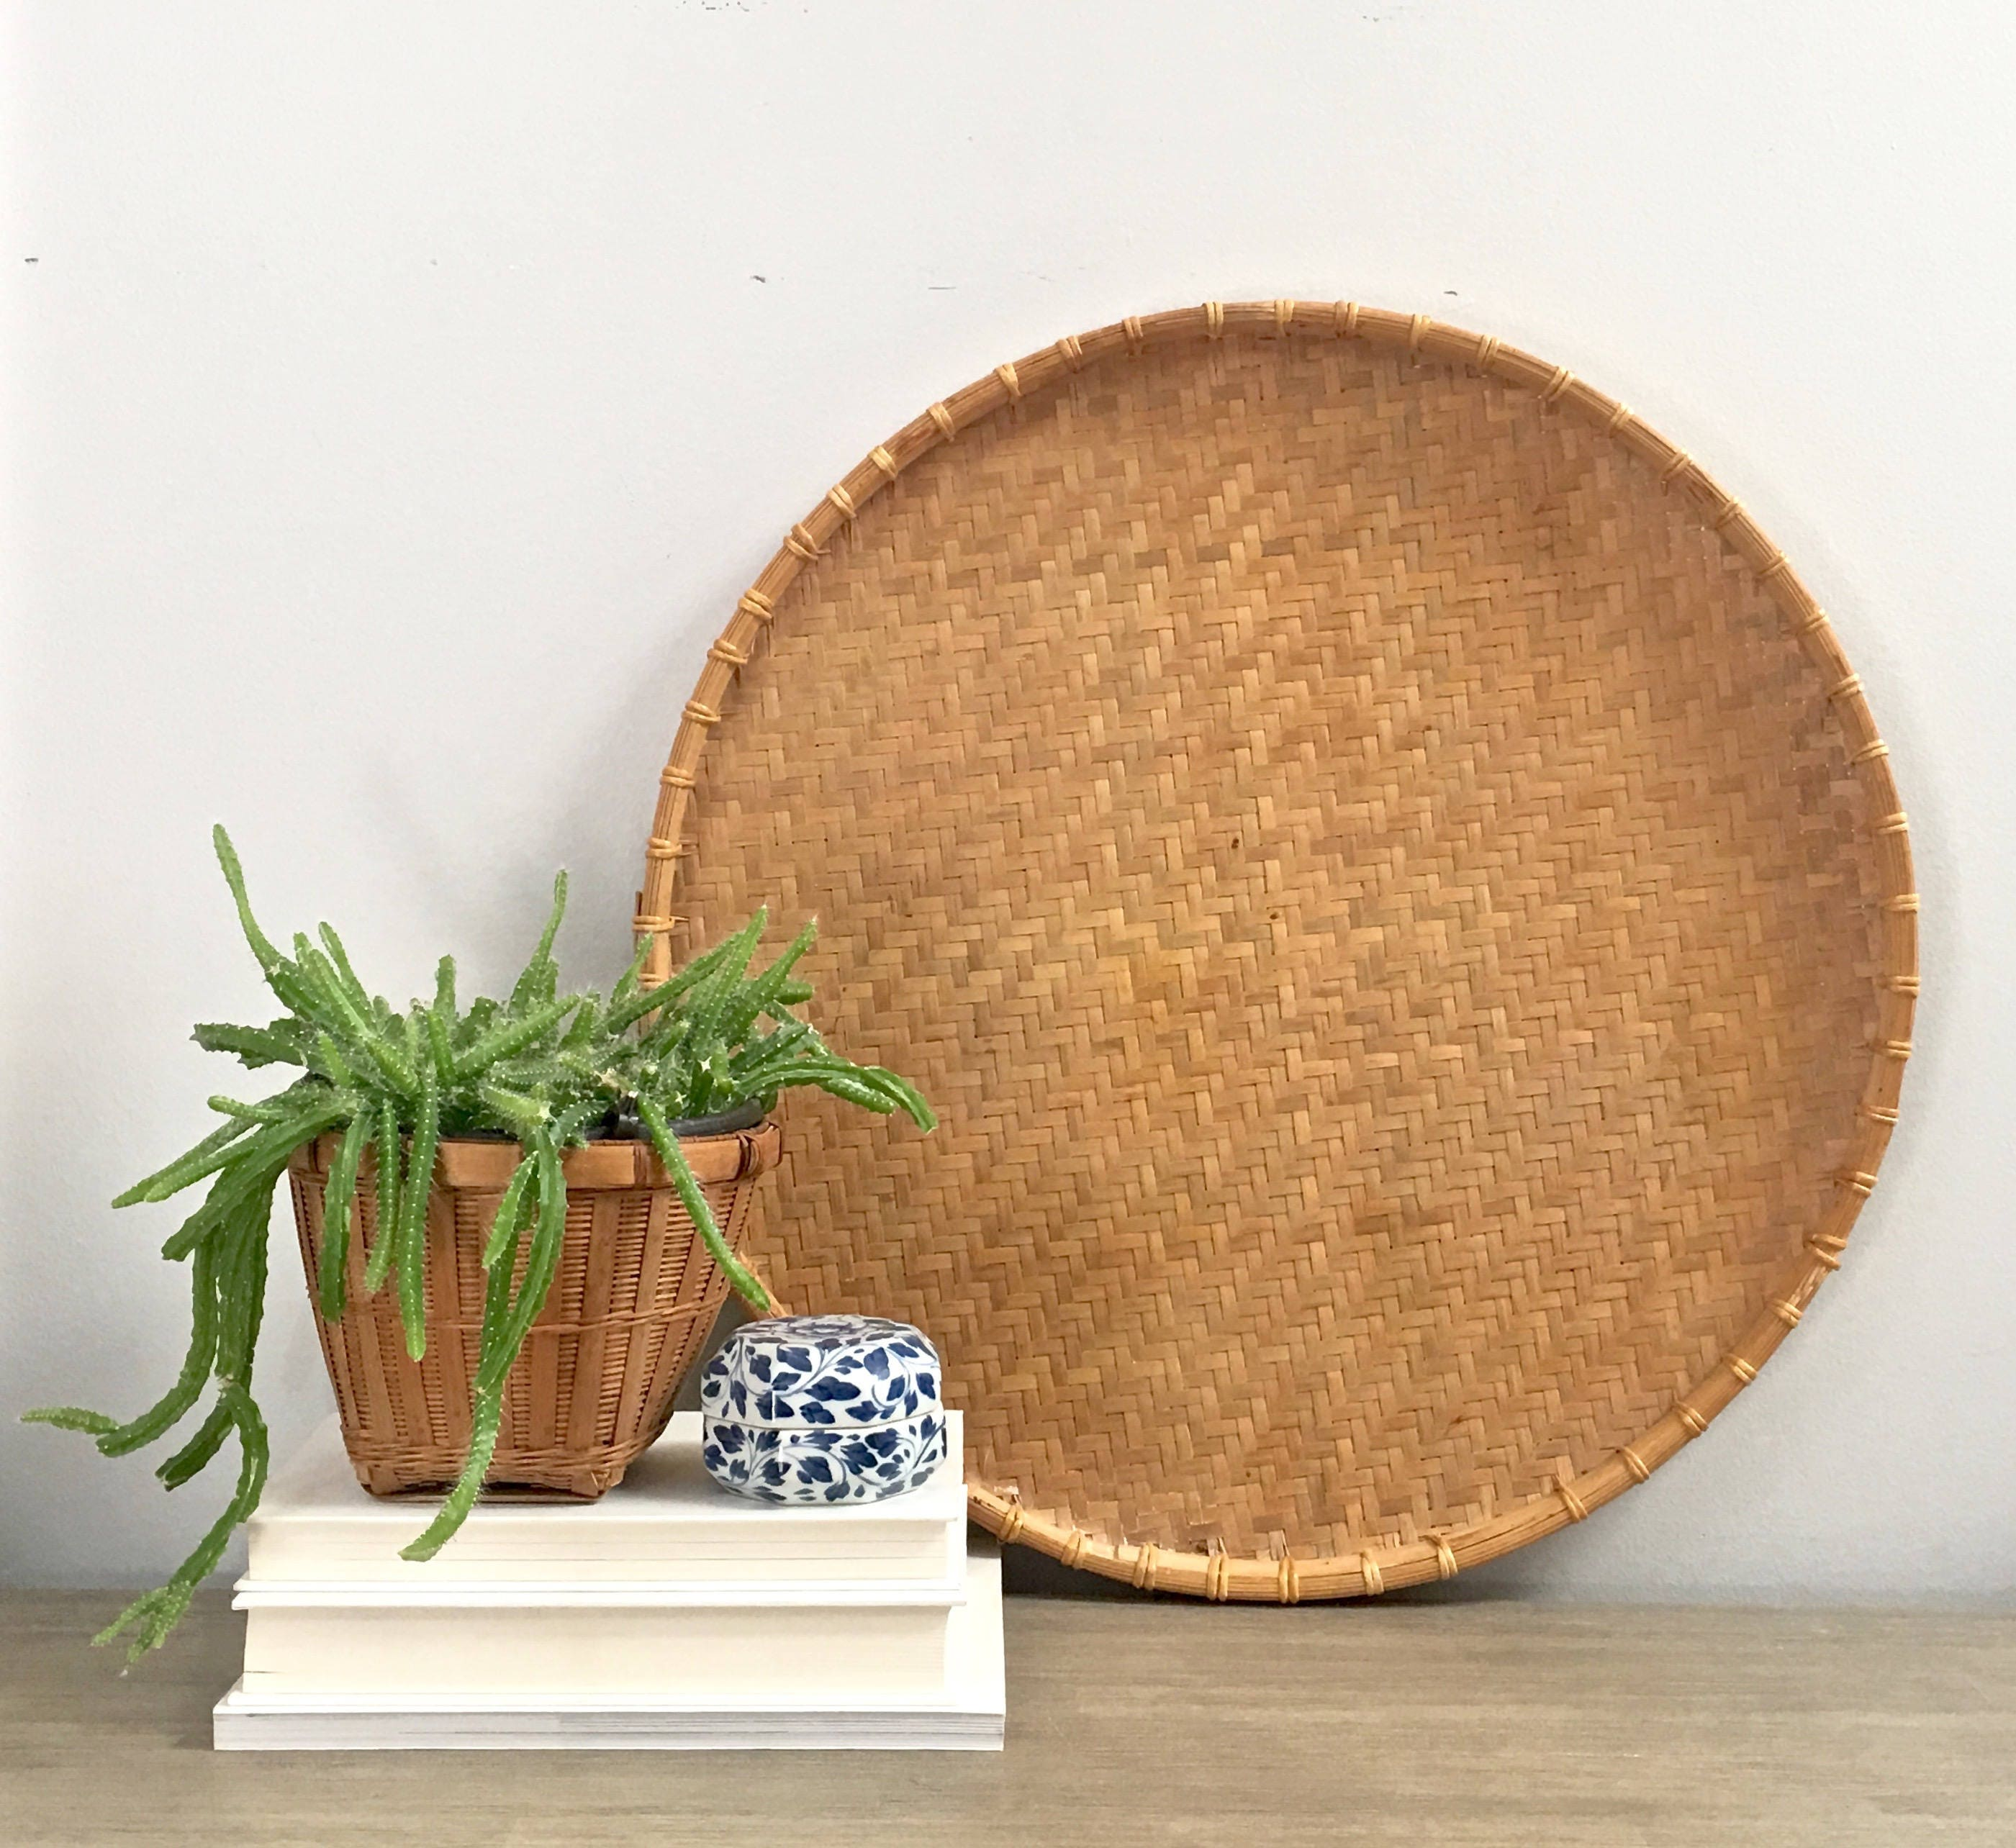 Large Vintage Woven Wall Basket Tray 20 Vintage Round Winnowing Bamboo Basket Coastal Tropical Boho Decor